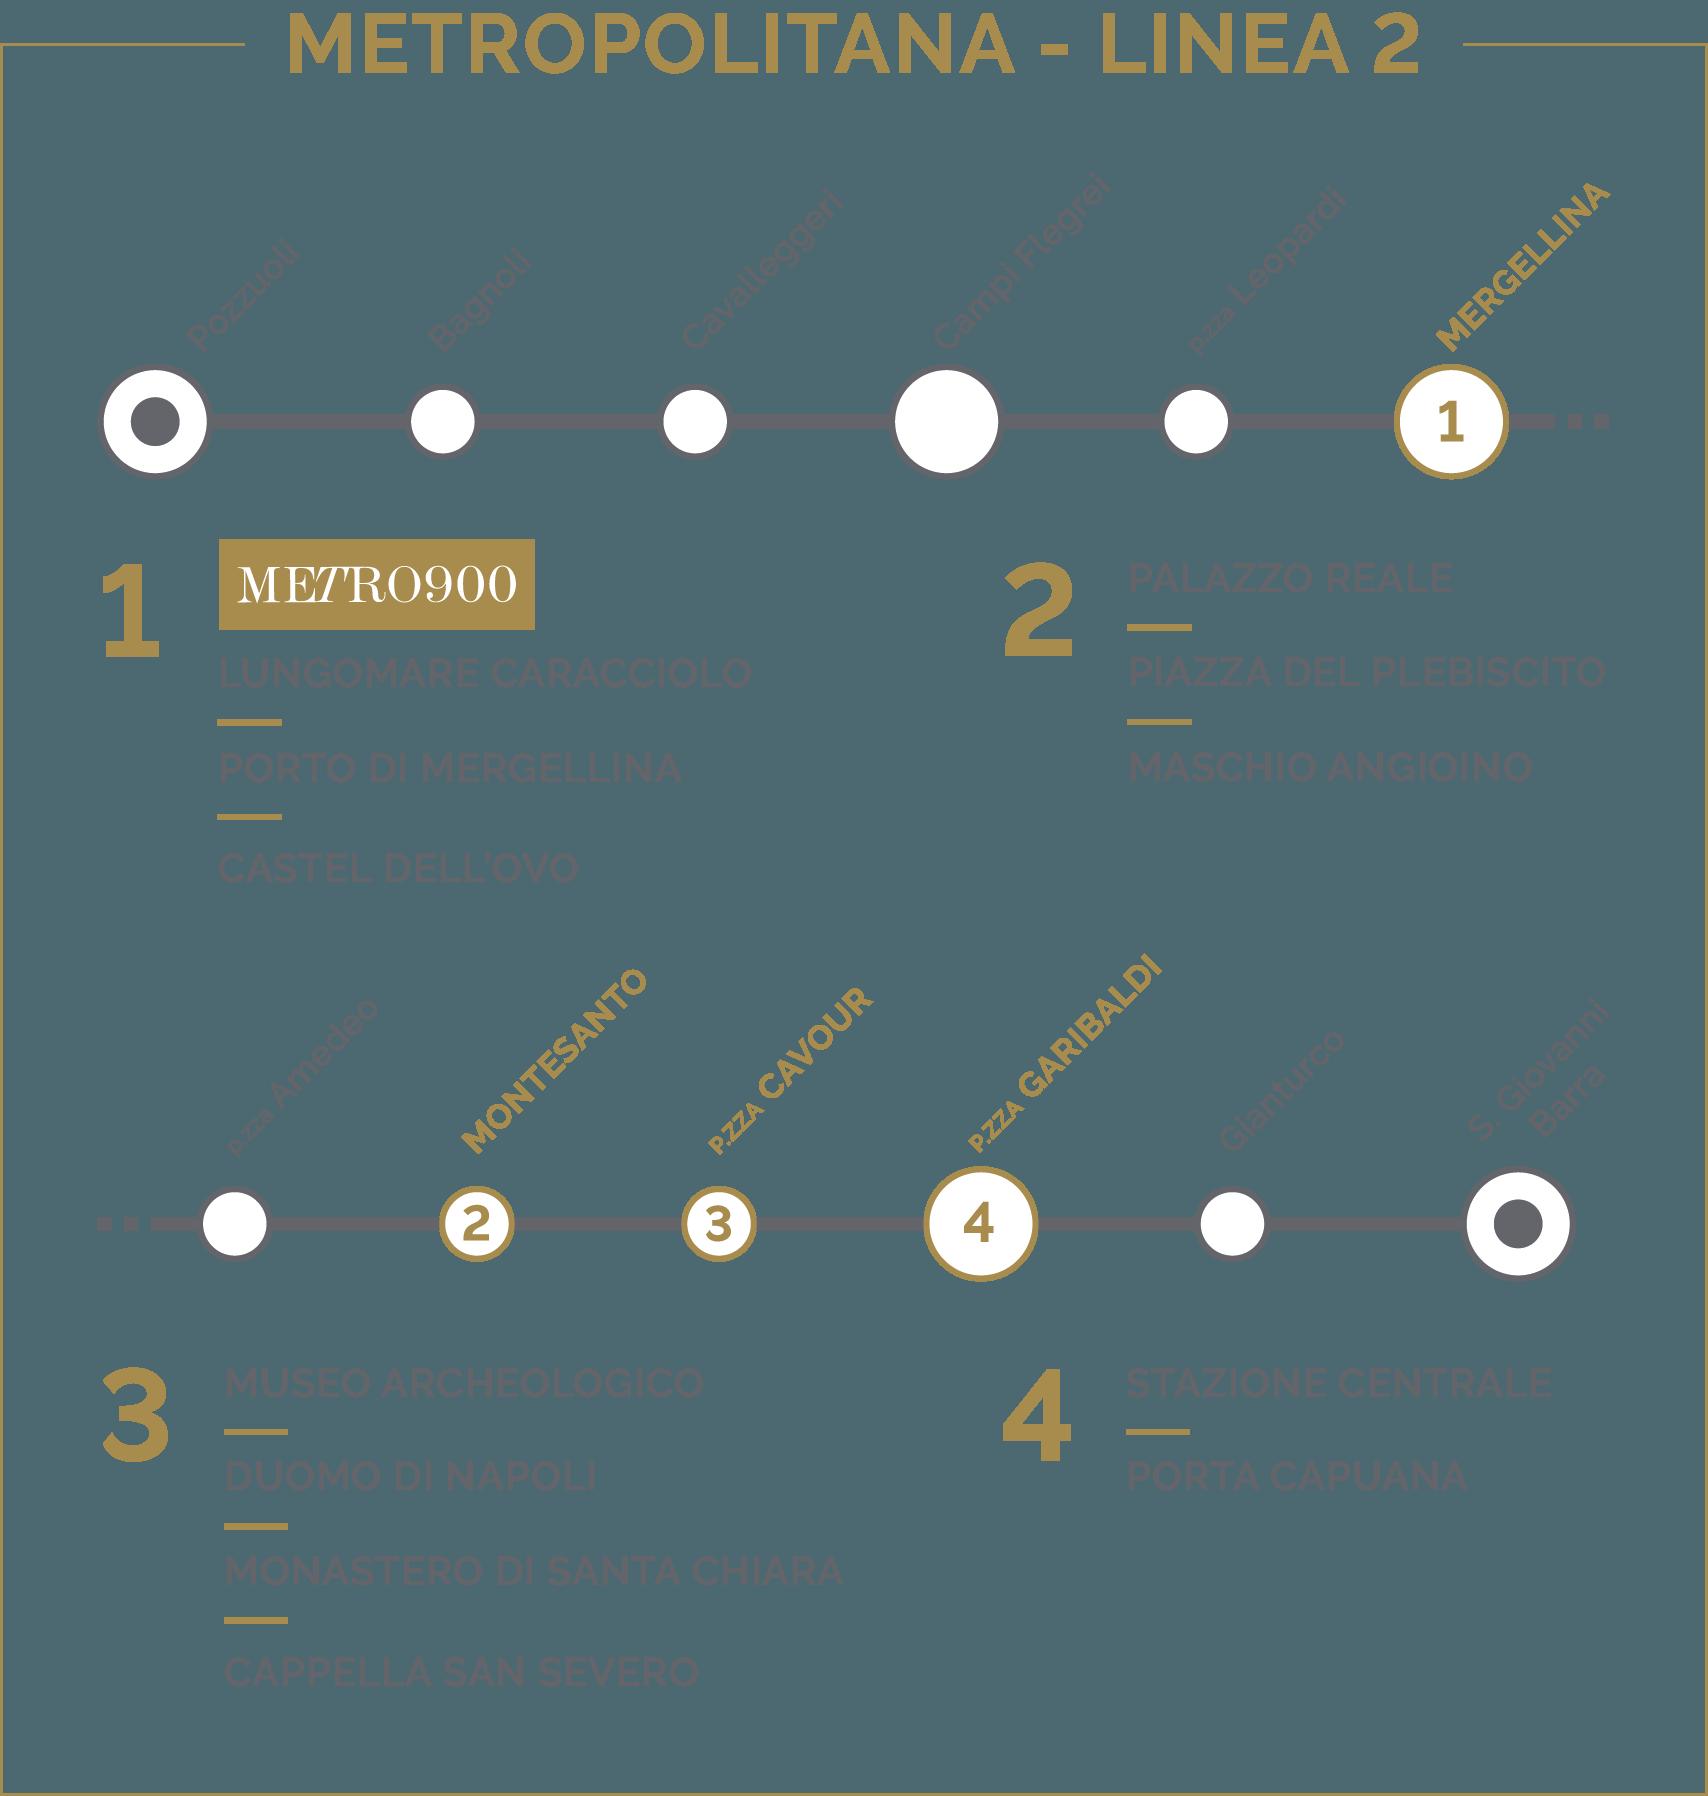 METRO900 - mappa metro 2 responsive ok